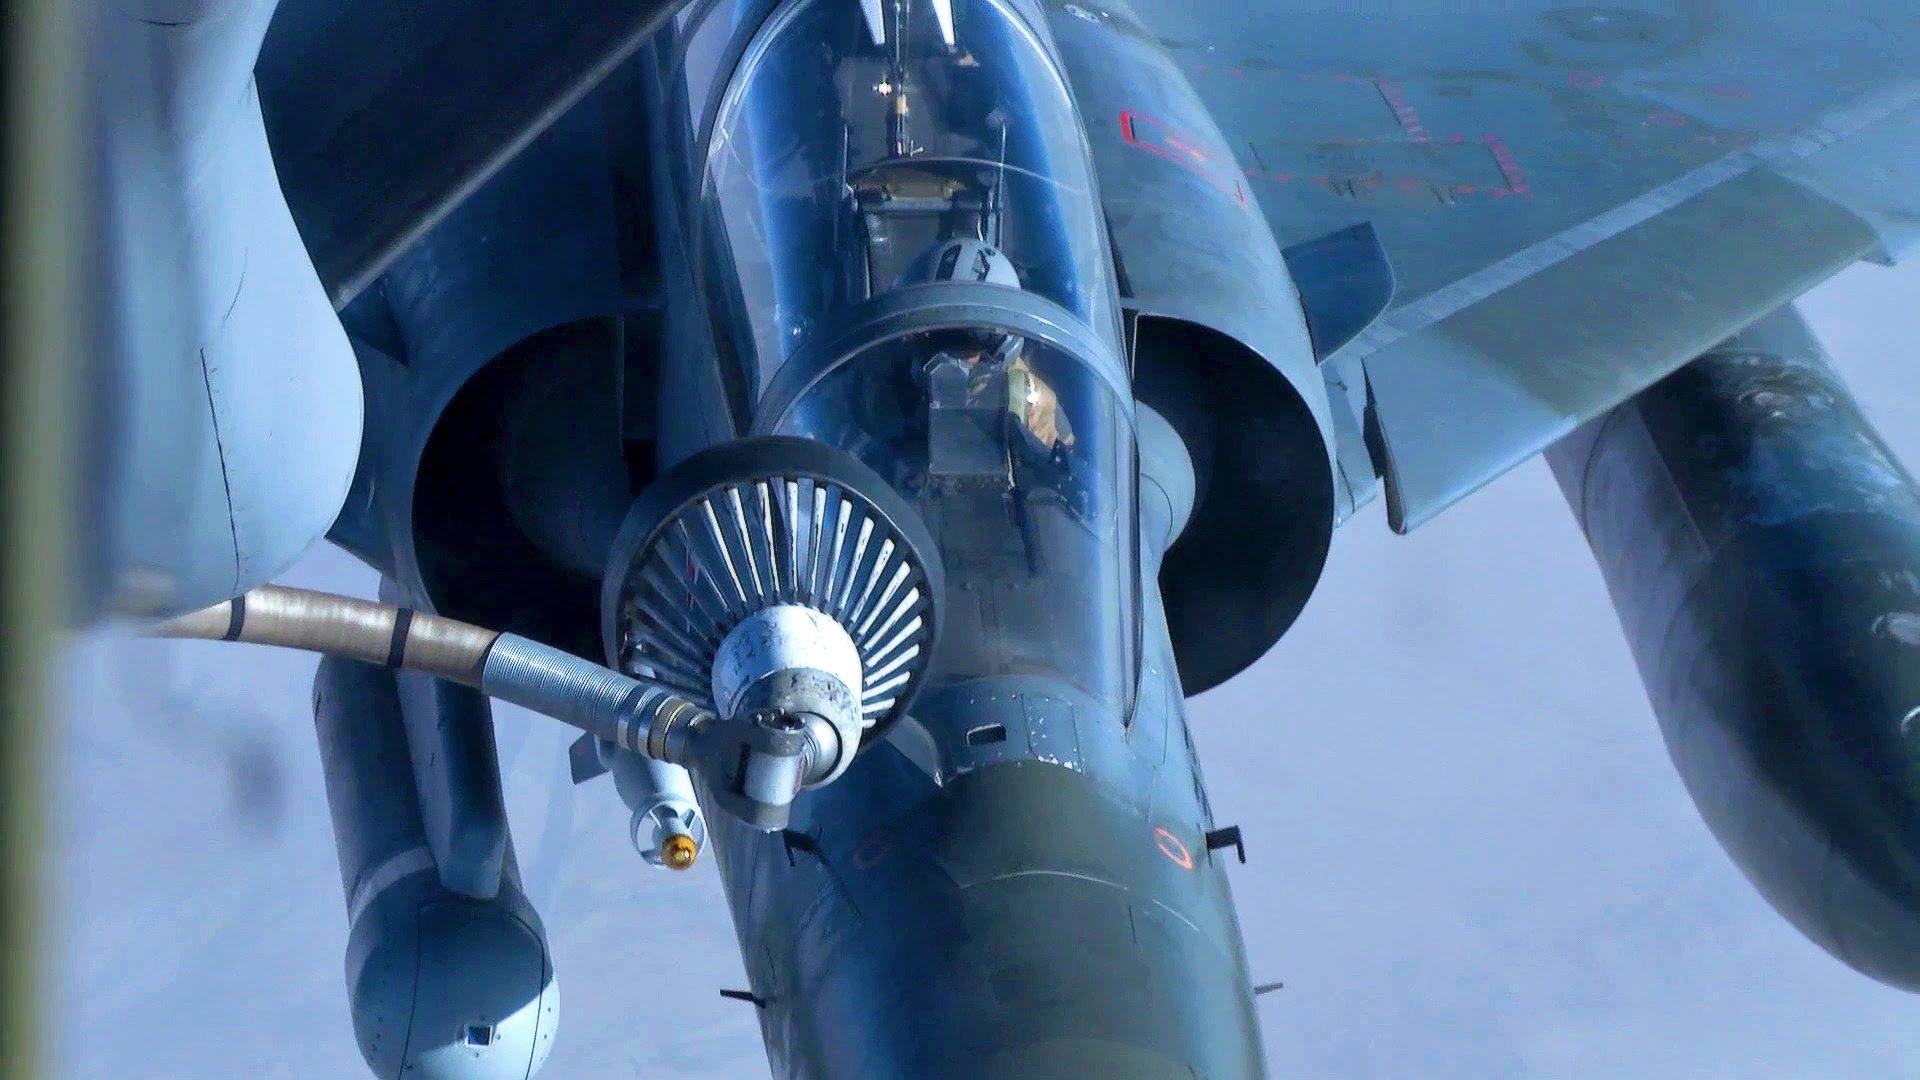 Armée de l'air Dassault Mirage Air Refuel by USAF